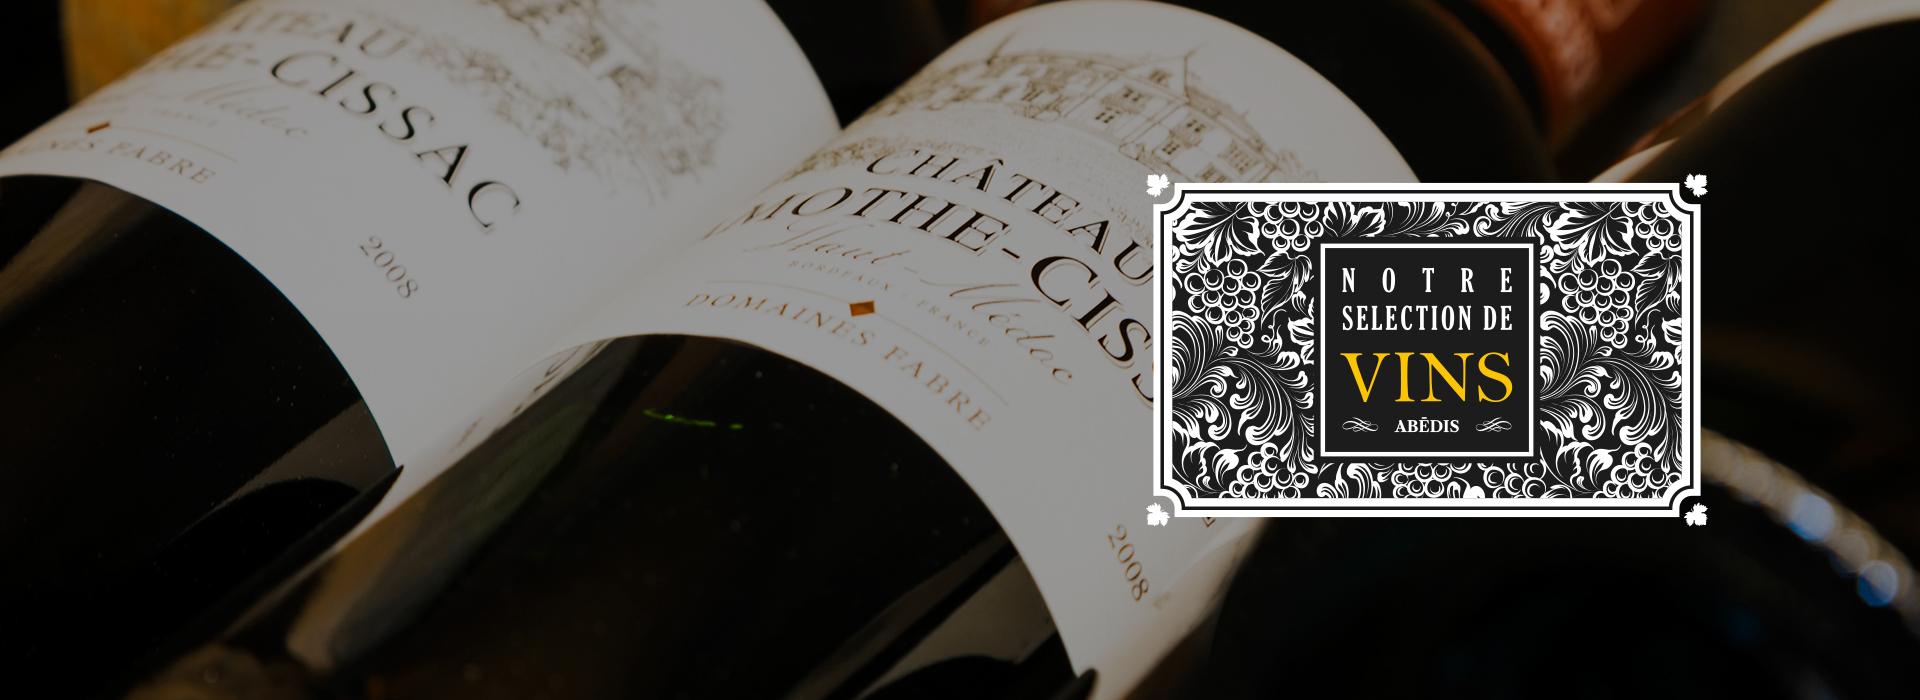 http://abedis.fr/wp-content/uploads/2018/10/Accueil-Banniere-vin-1920x700.jpg